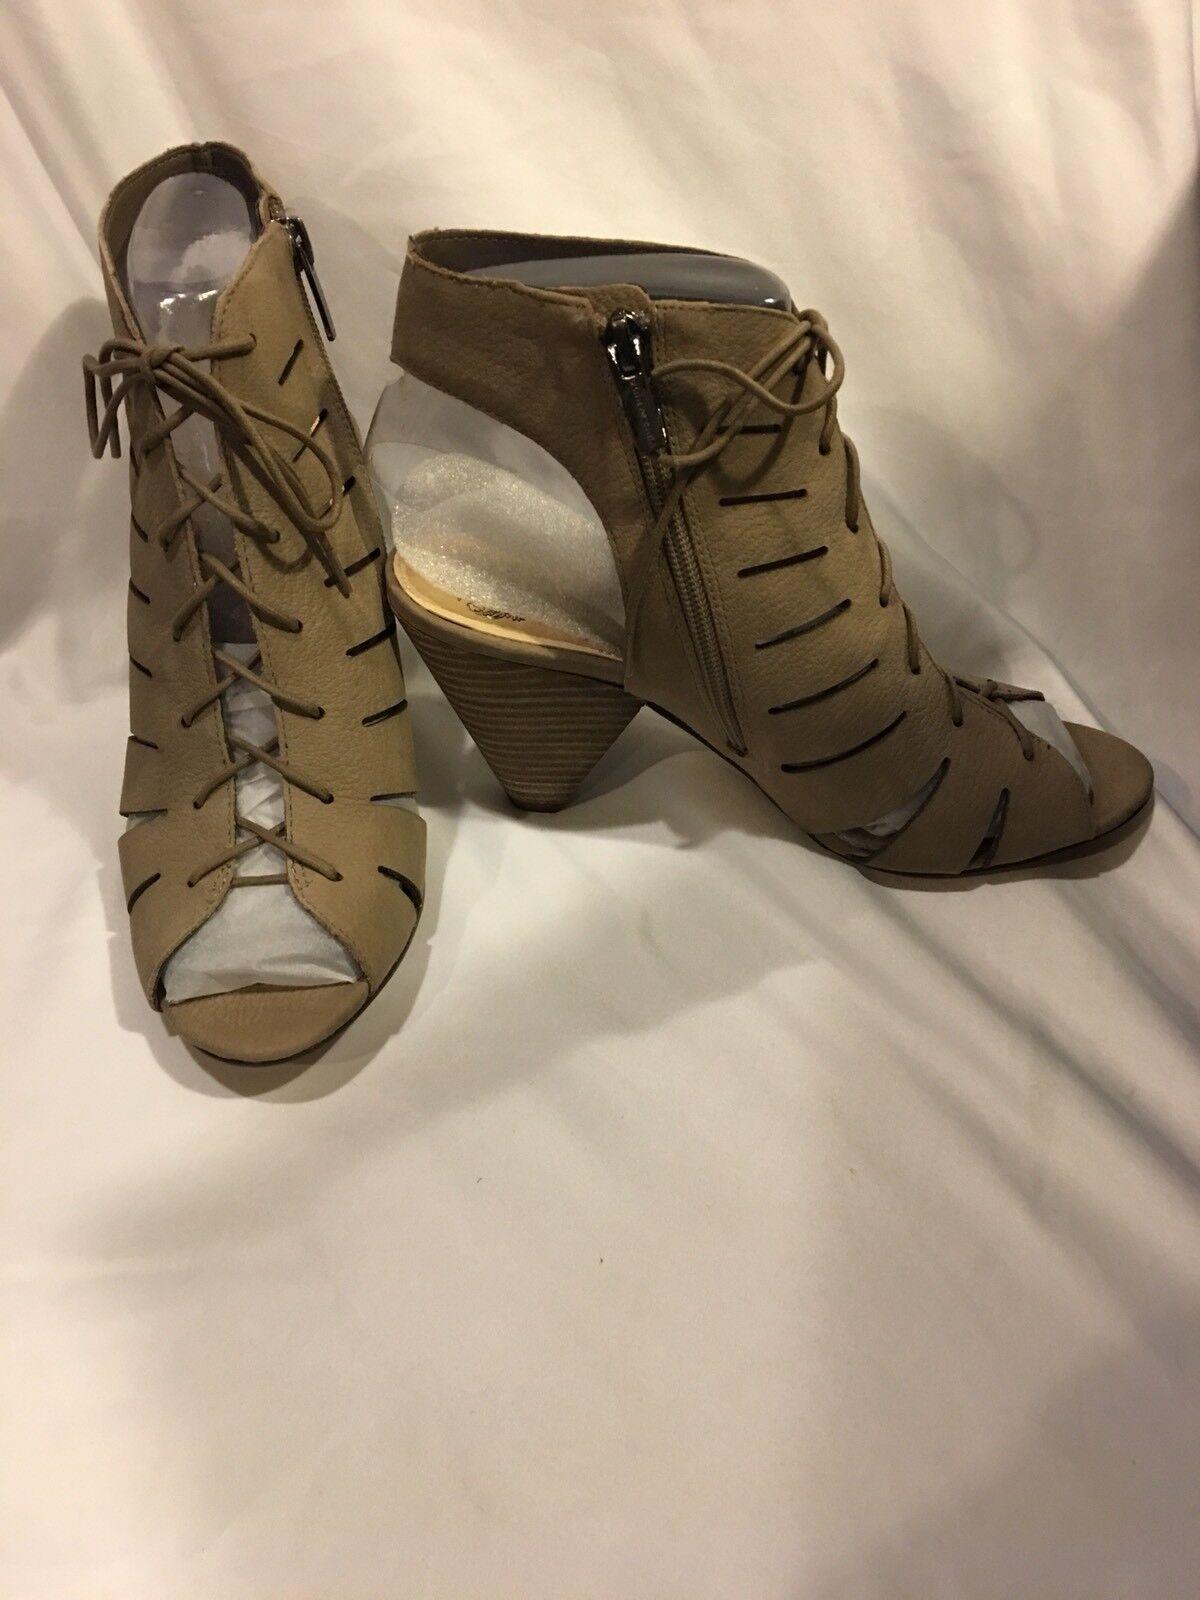 Vince Camuto Estie donna donna donna US 8 Taupe Sandals Cut Out scarpe donna Heels Lace Up 6f8e98